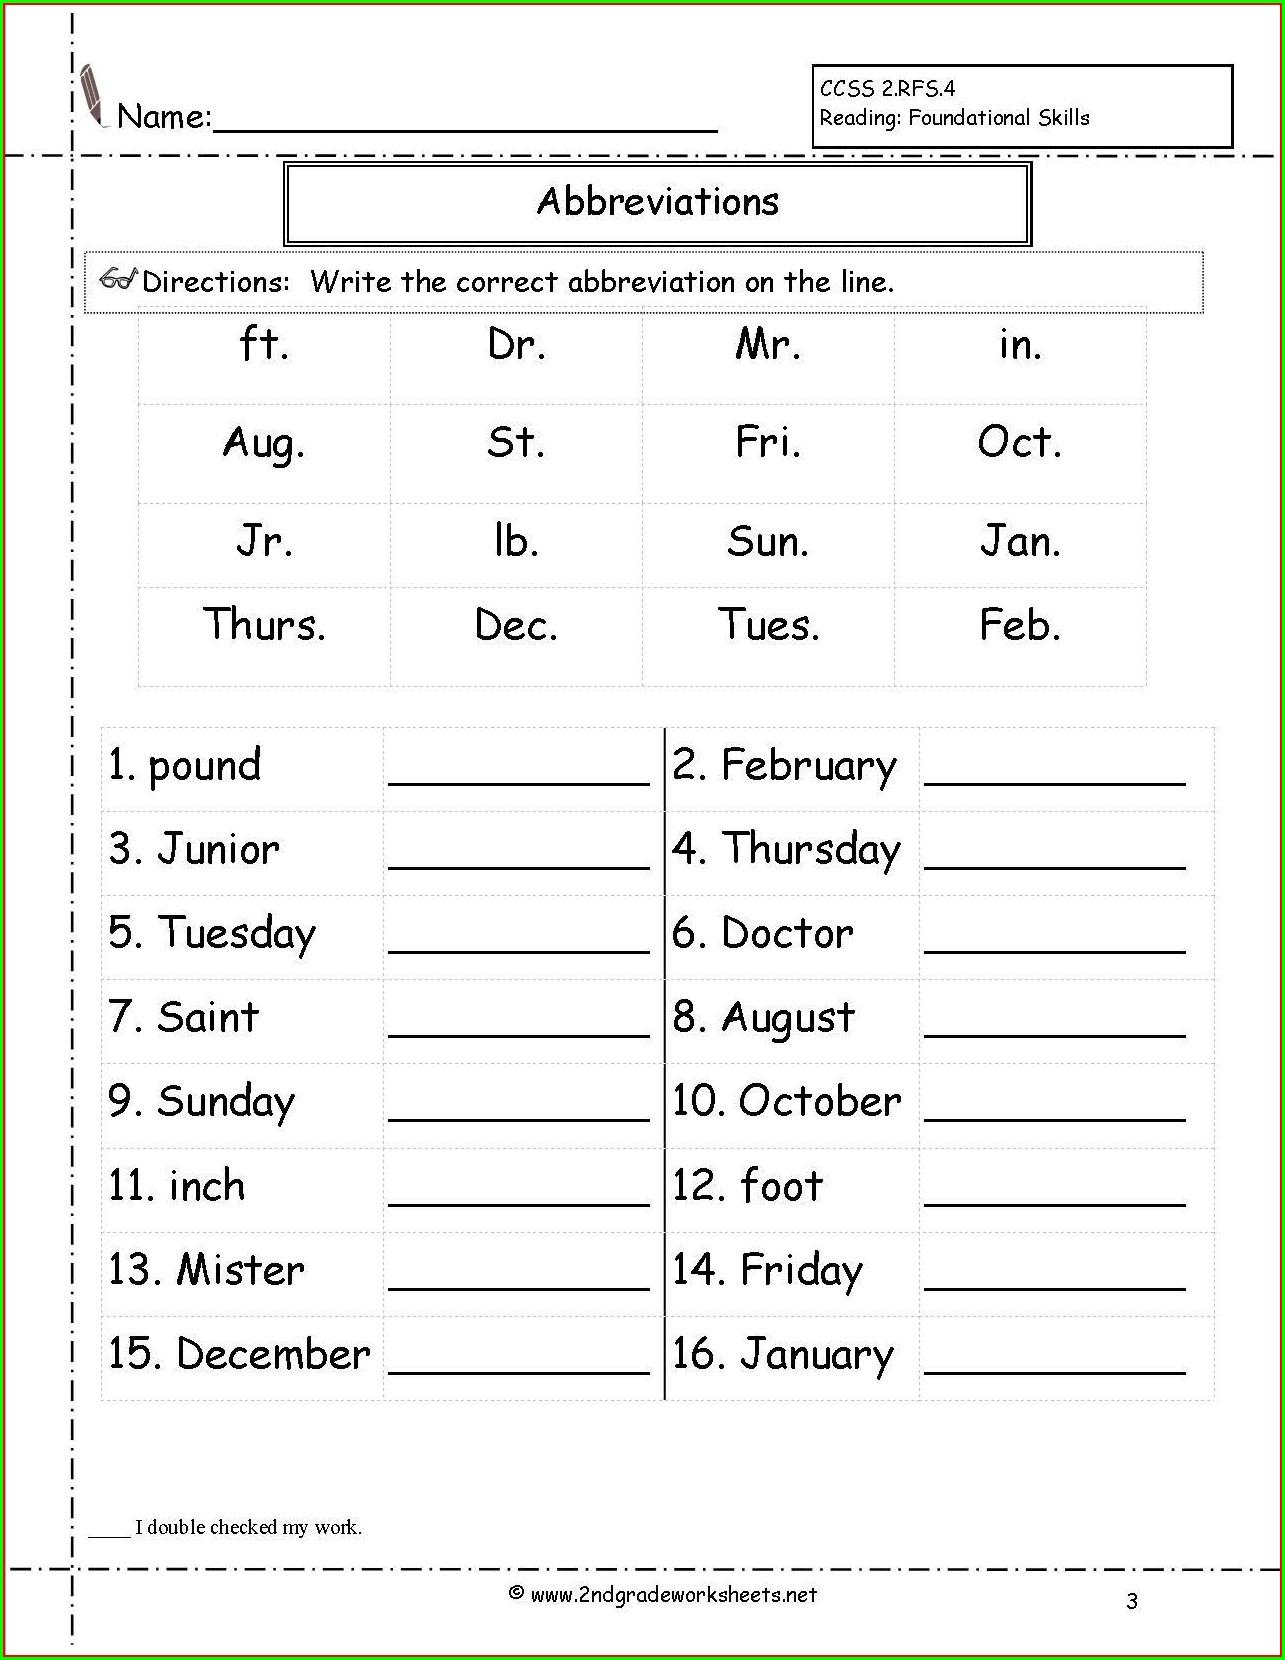 Grammar Free Printable 3rd Grade Worksheets